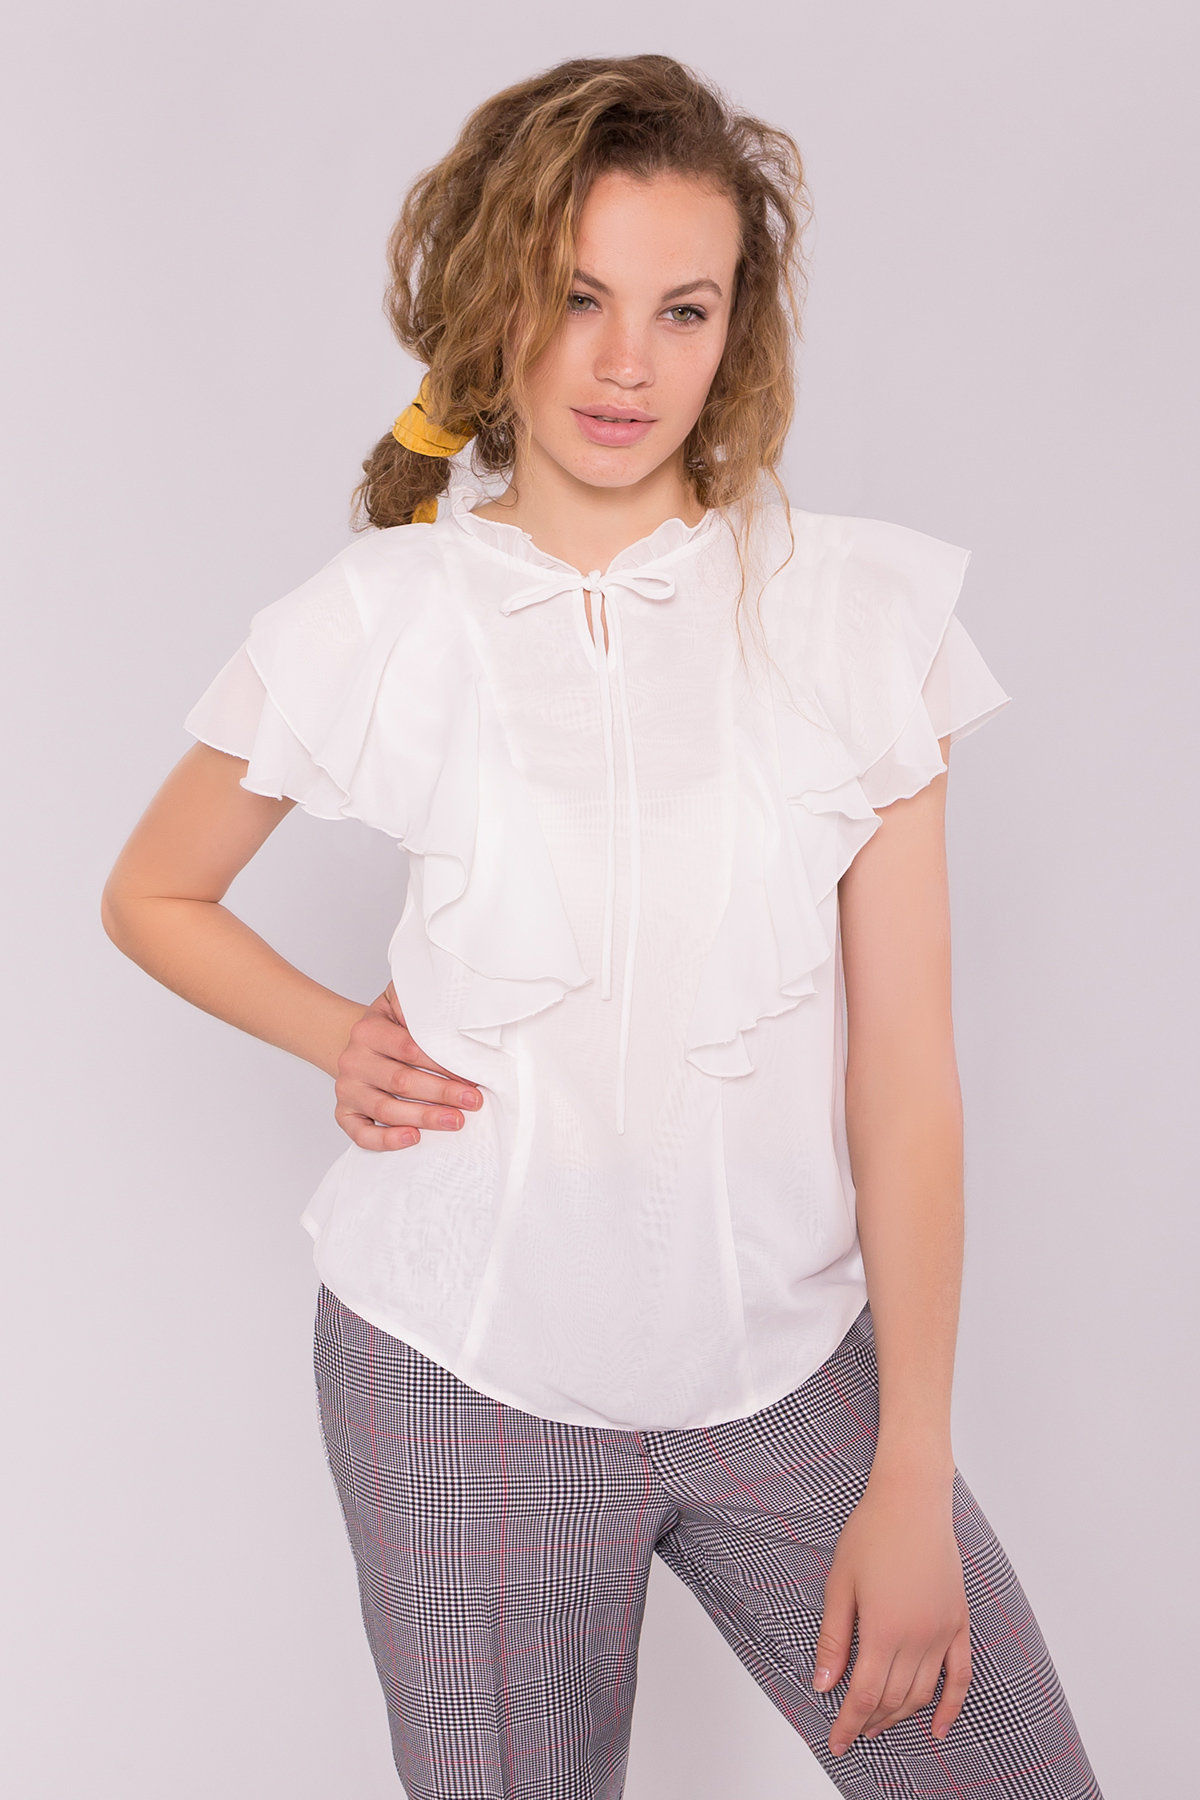 Блуза Дайан 7235 АРТ. 42830 Цвет: Молоко - фото 3, интернет магазин tm-modus.ru